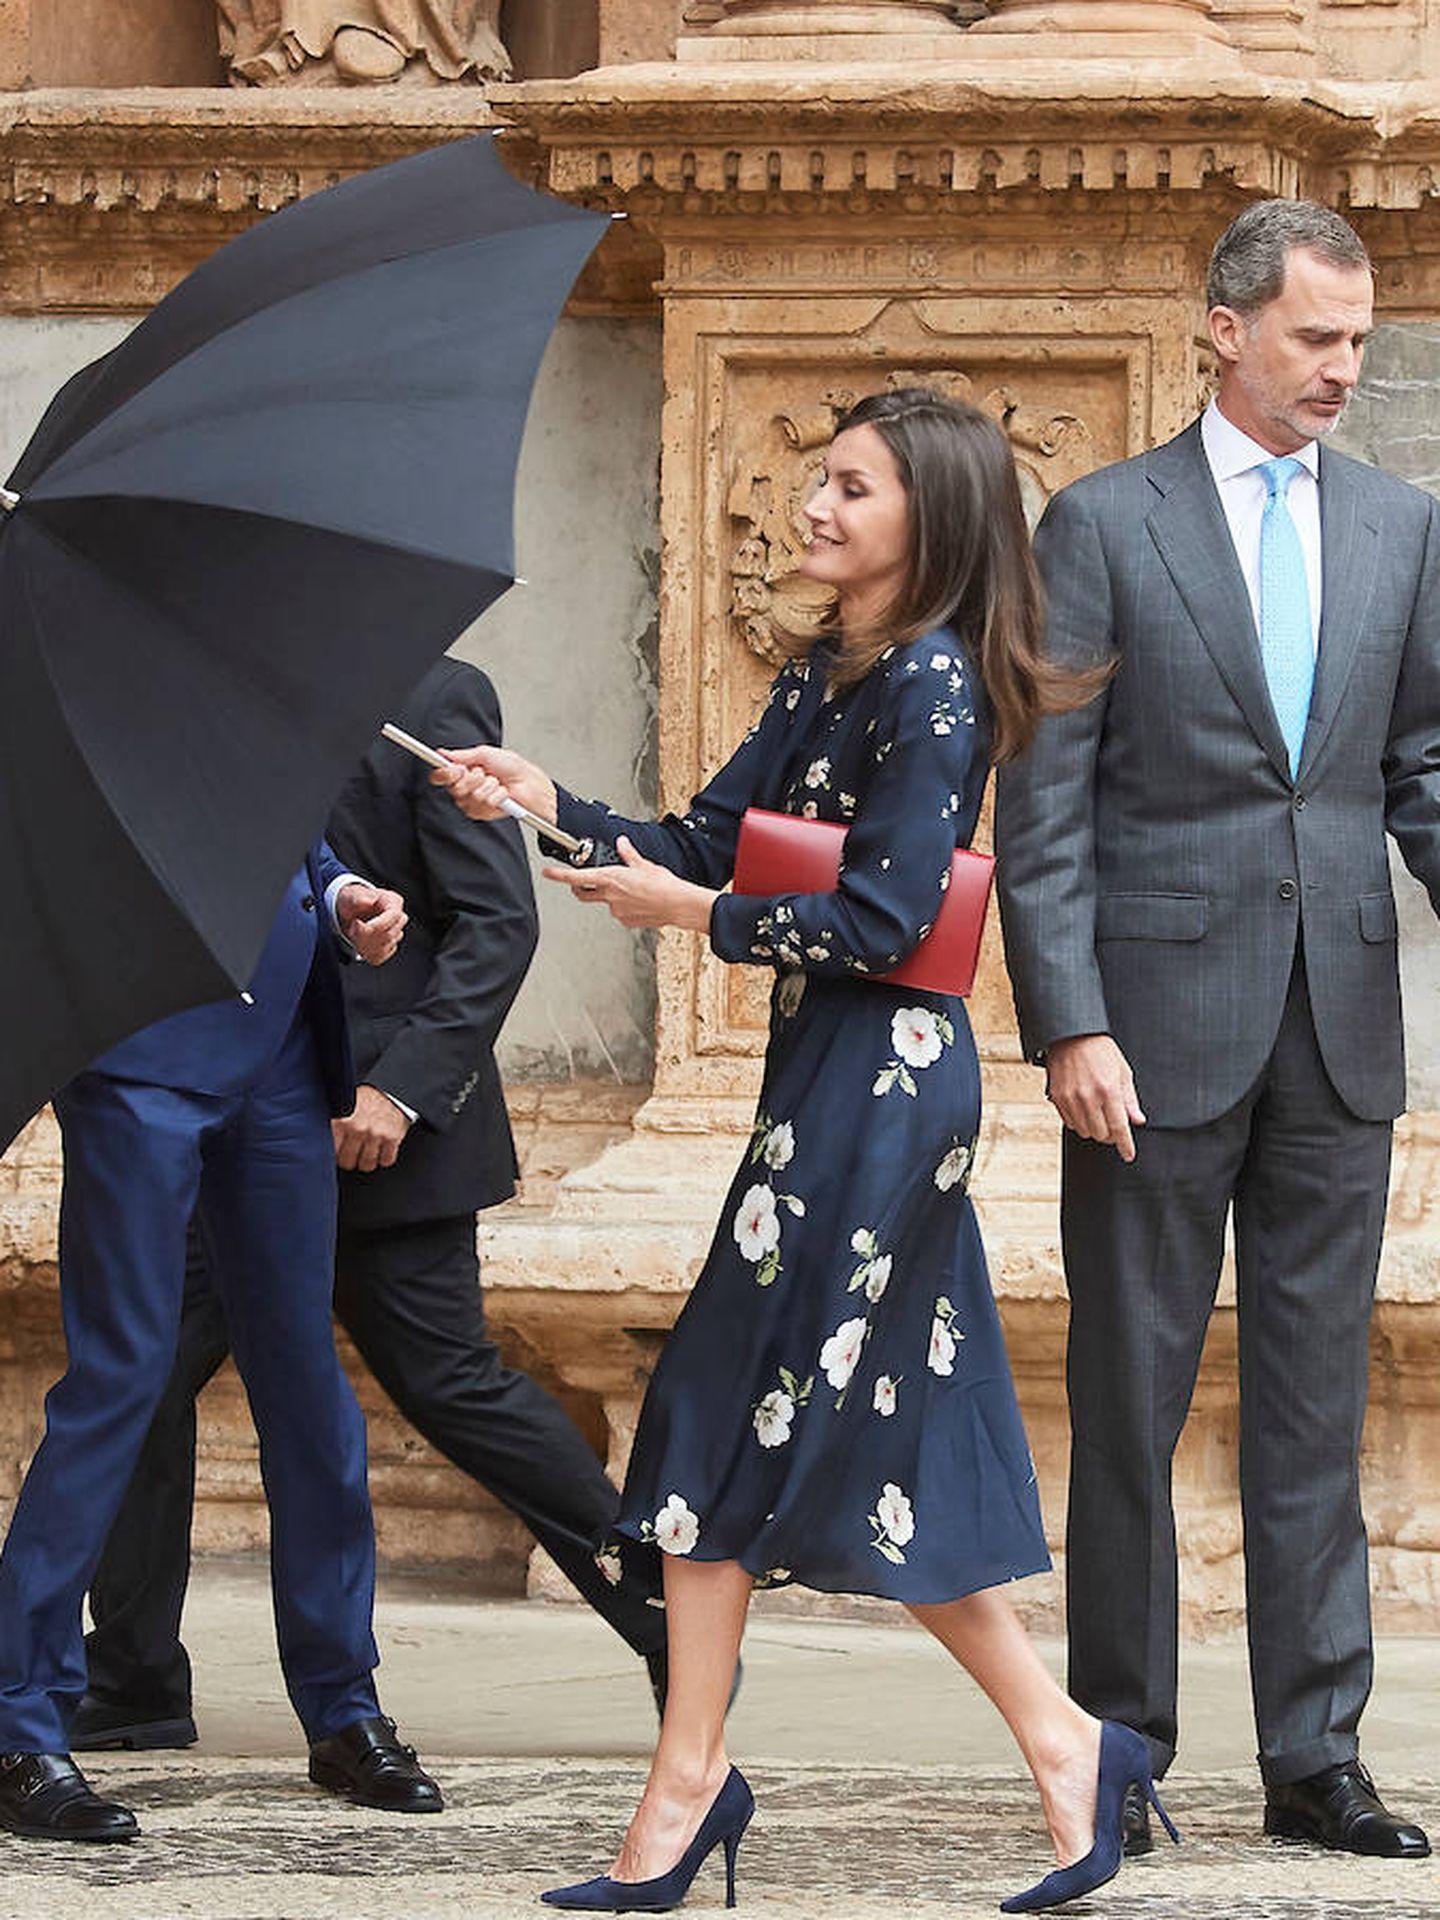 La Reina abre el paraguas para resguardarse de la lluvia. (Limited Pictures)